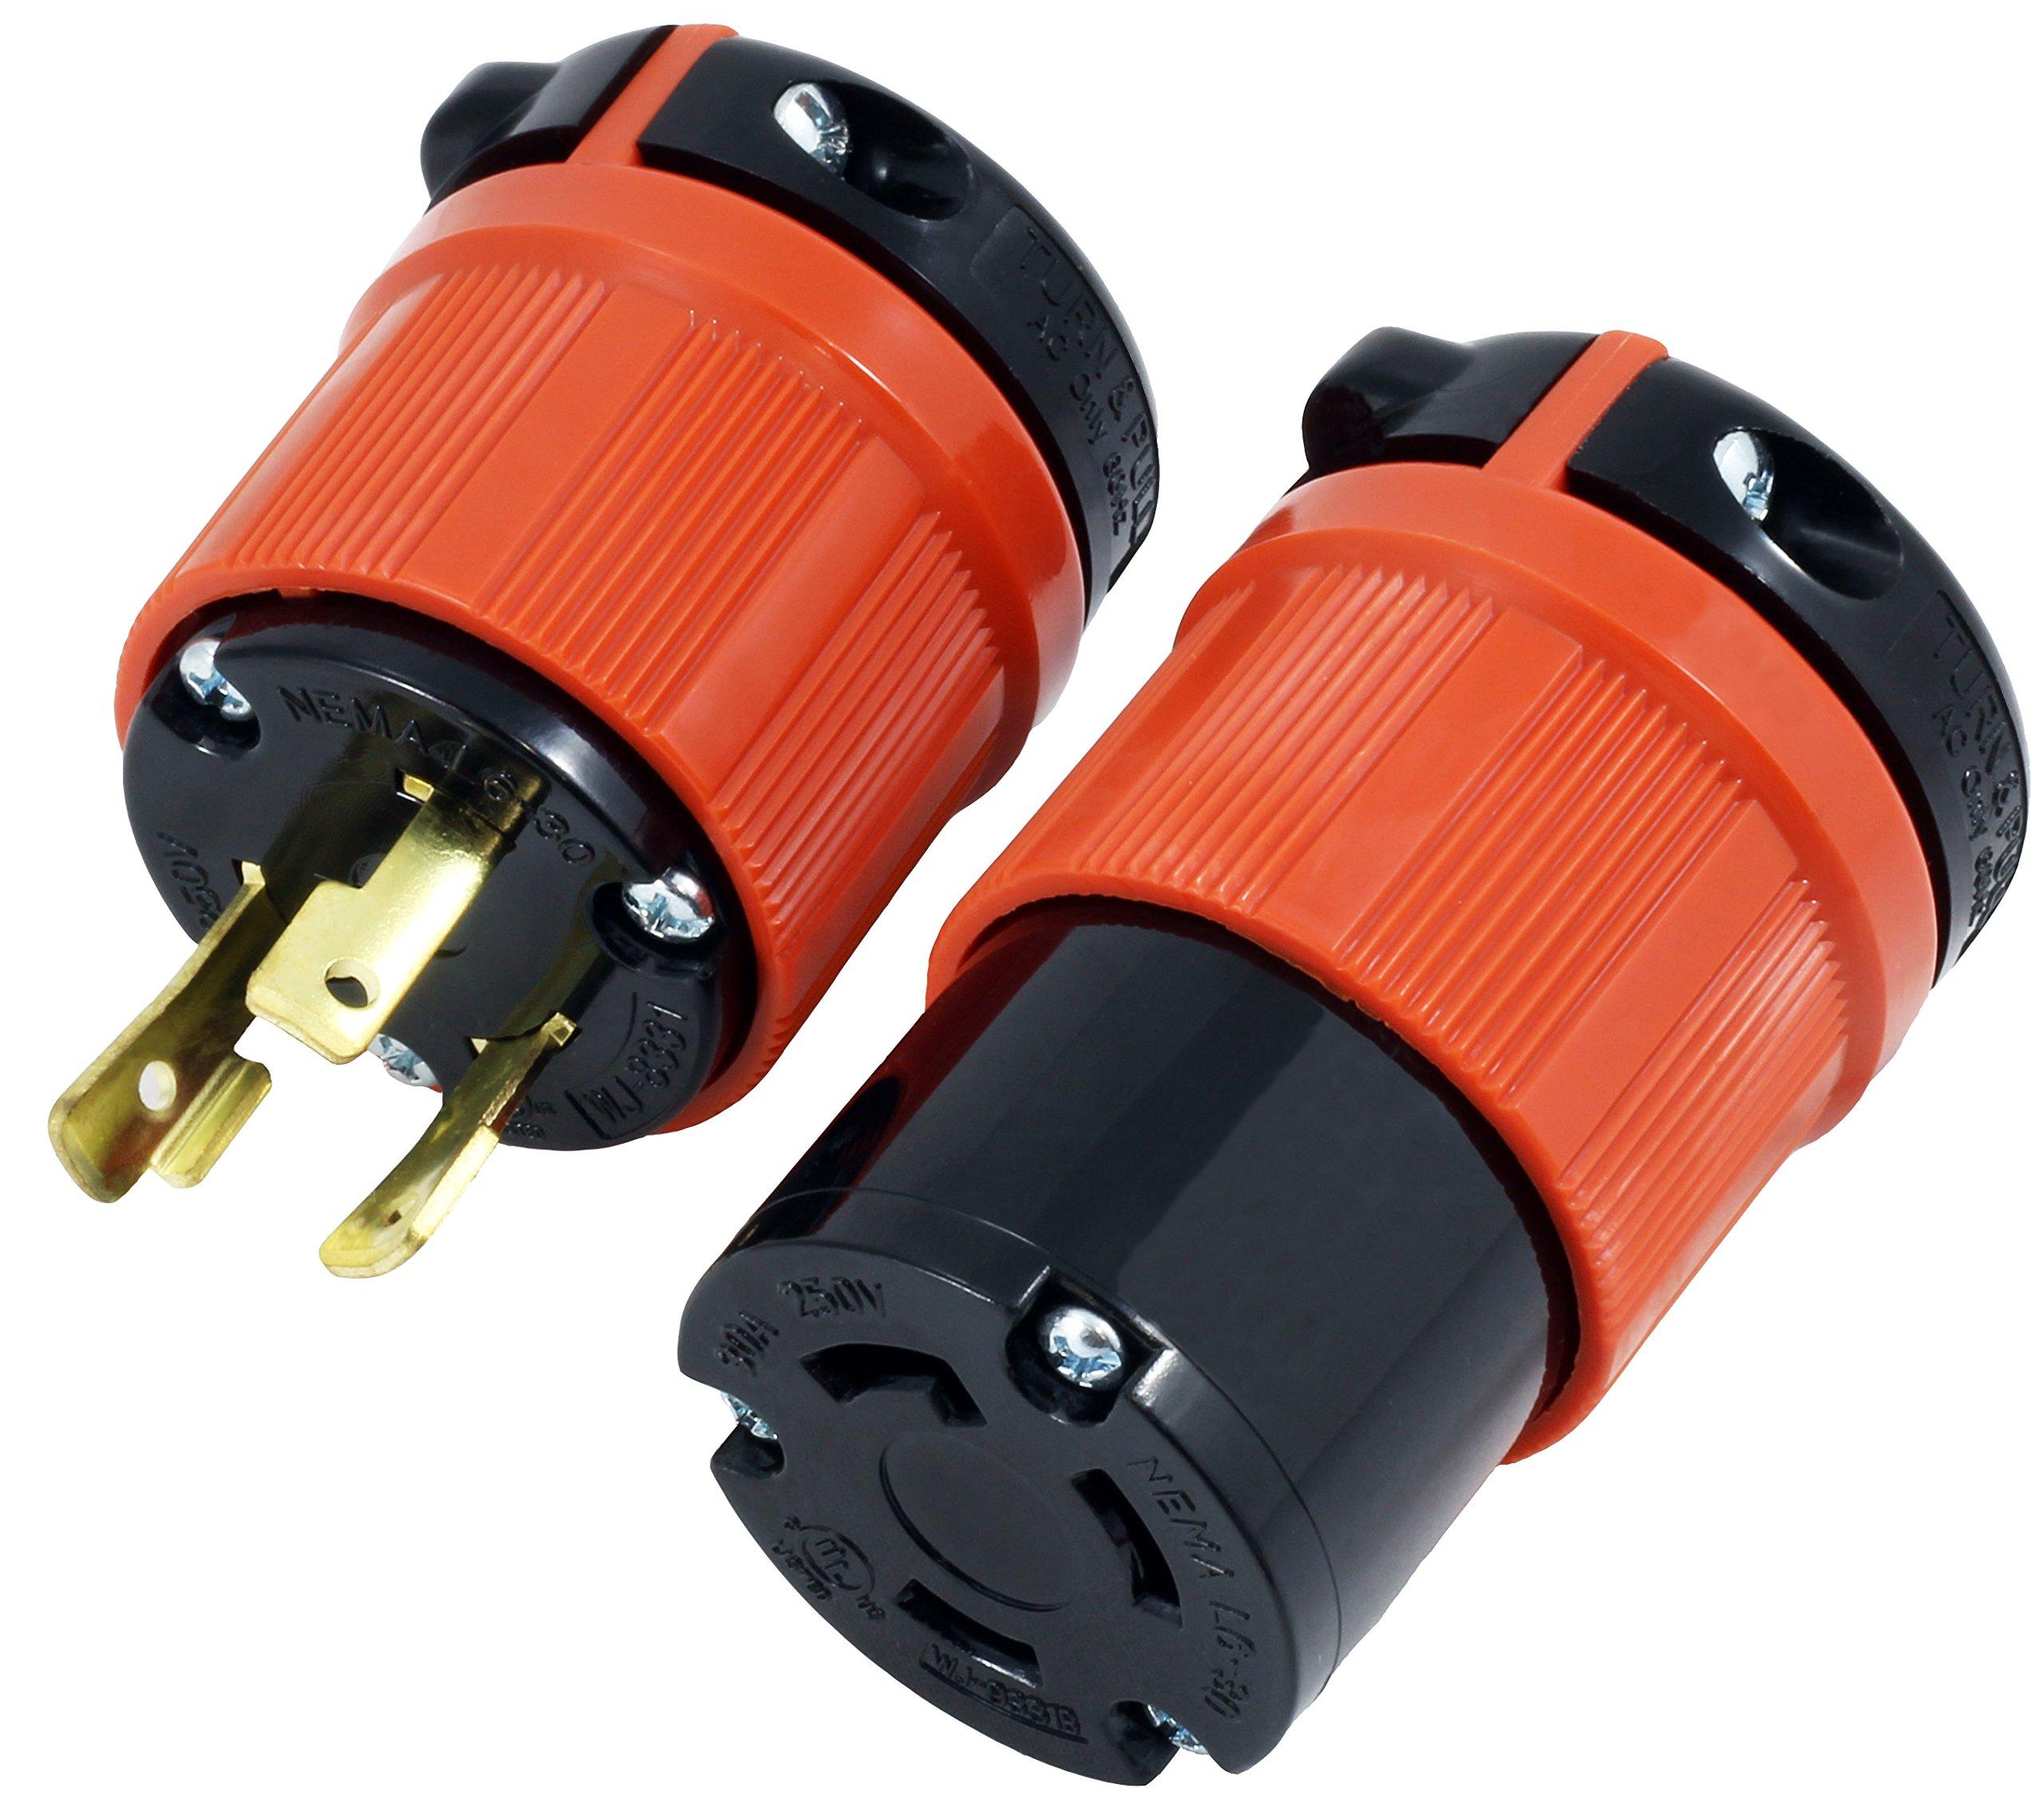 AC WORKS [ASL630PR] NEMA L6-30 30Amp 250Volt 3Prong Locking Male Plug and Female Connector UL, C-UL Approval